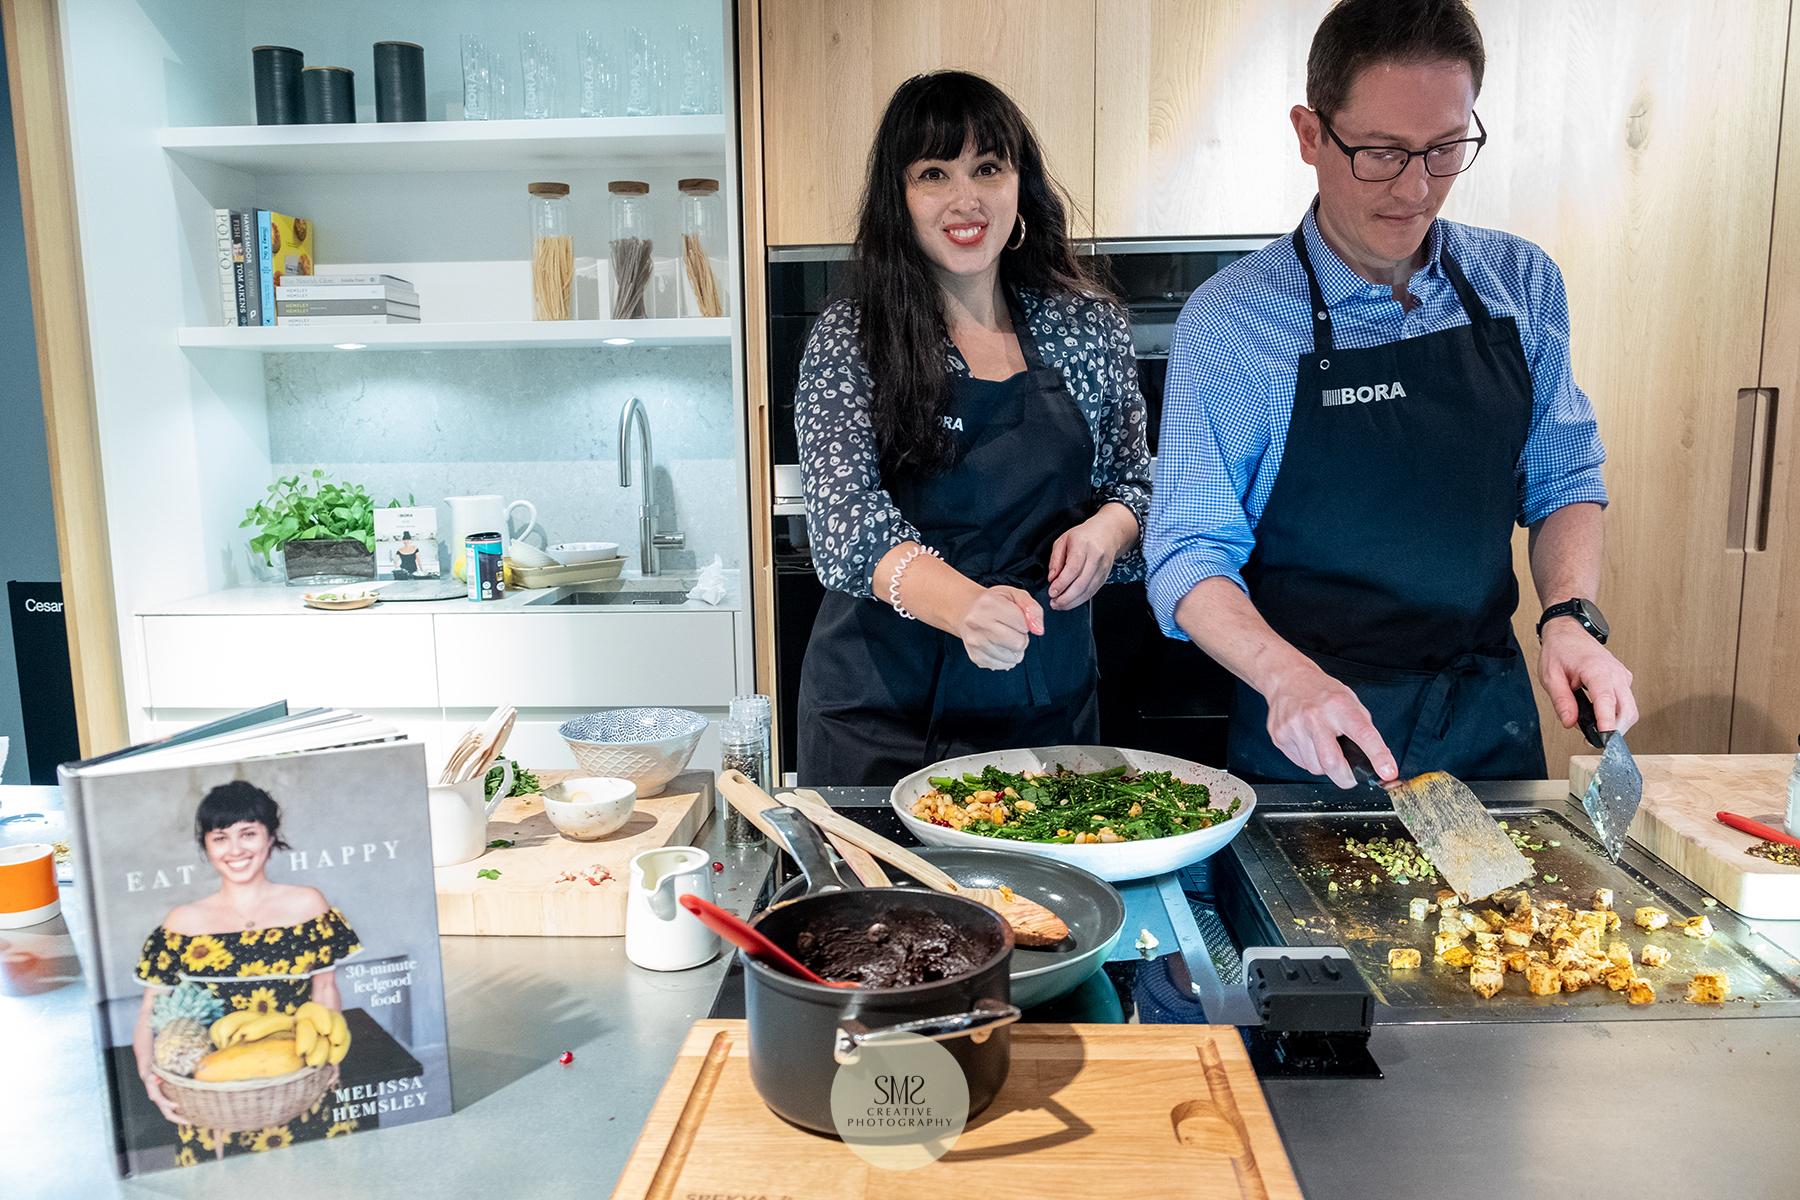 'Espresso Design' cookery demonstration by food guru Melissa Hemsley for Bora kitchen appliances